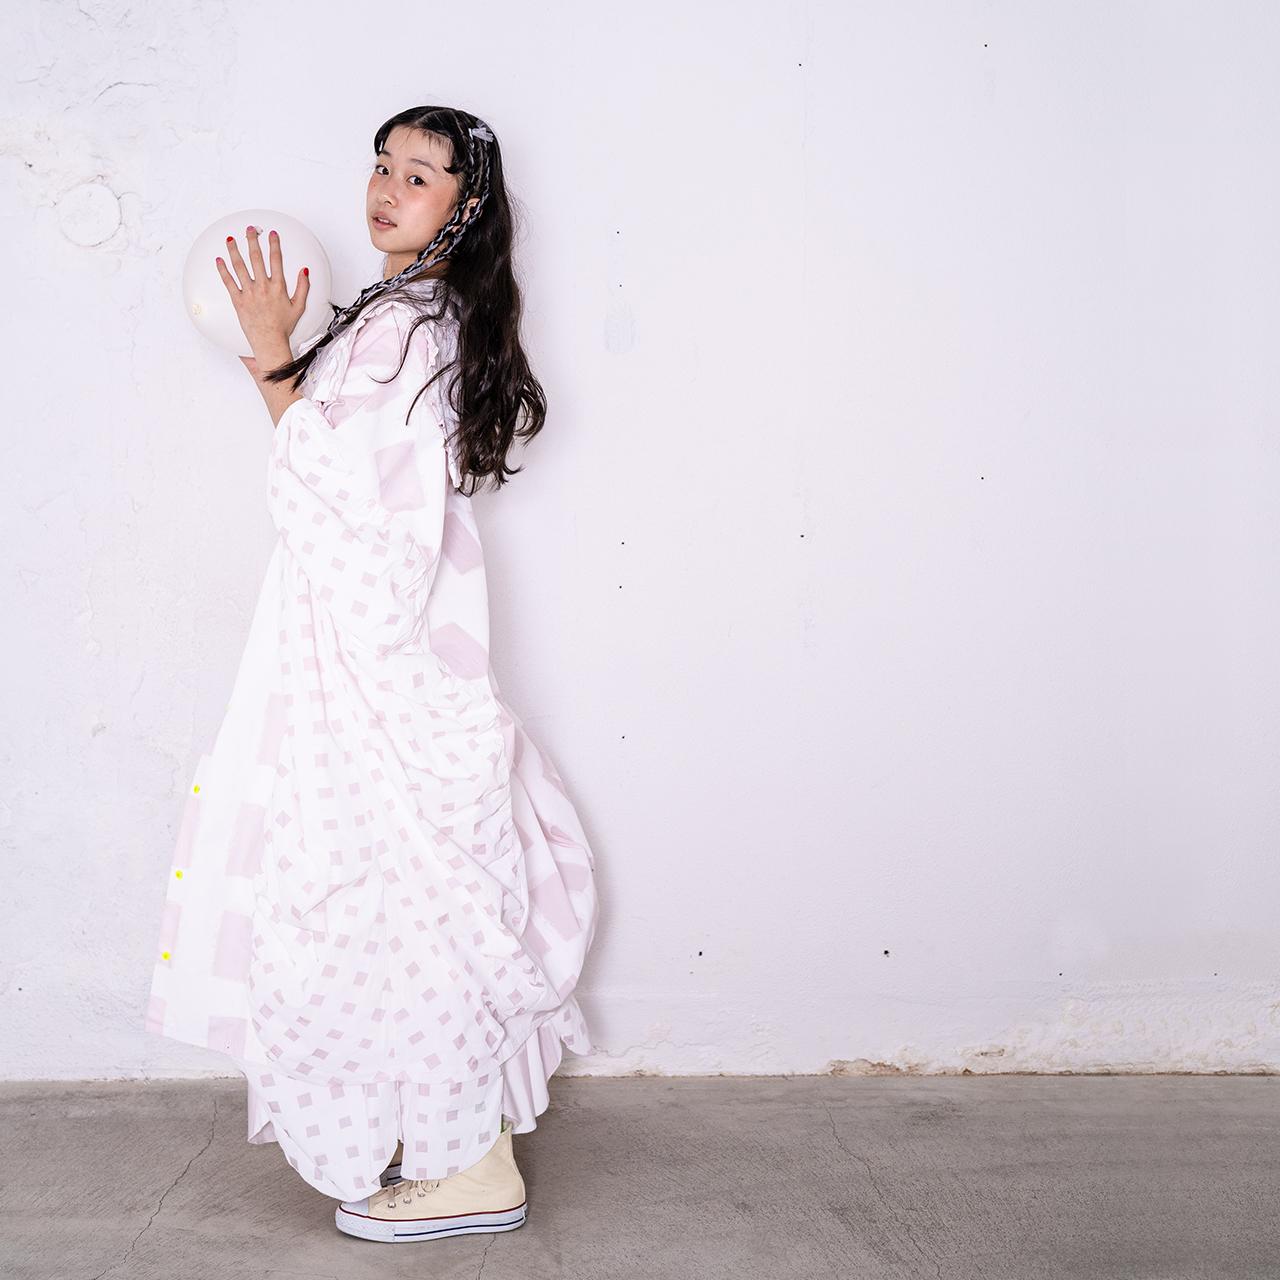 ORIG. CHECK MIX PENTAGON DRESS SHIRT / WOMEN